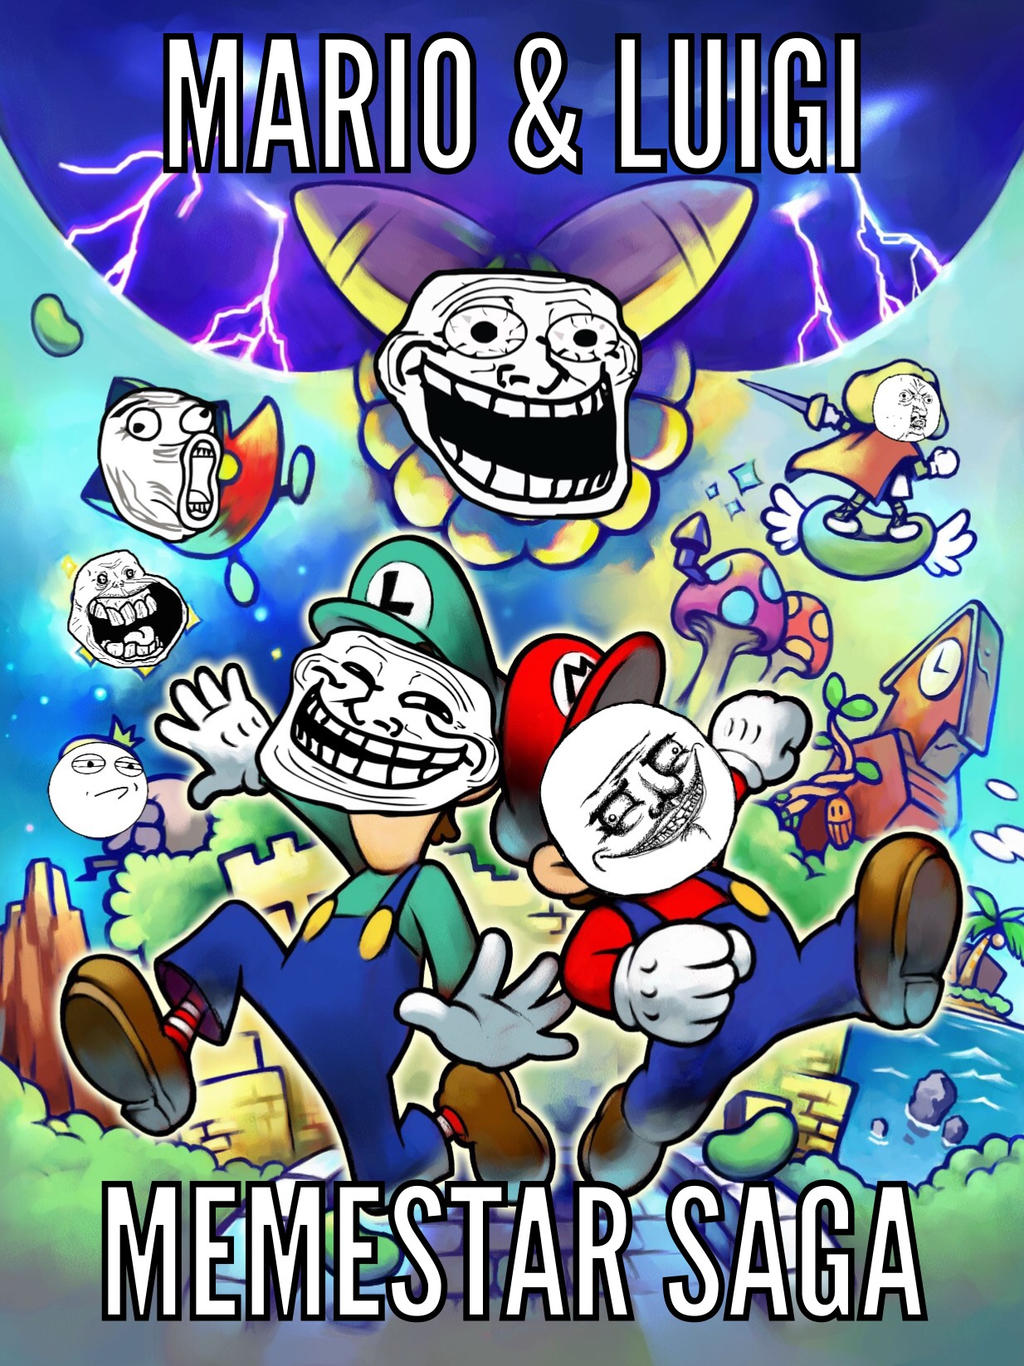 Mario And Luigi Memestar Saga My Meme By Chase Da Umbreon